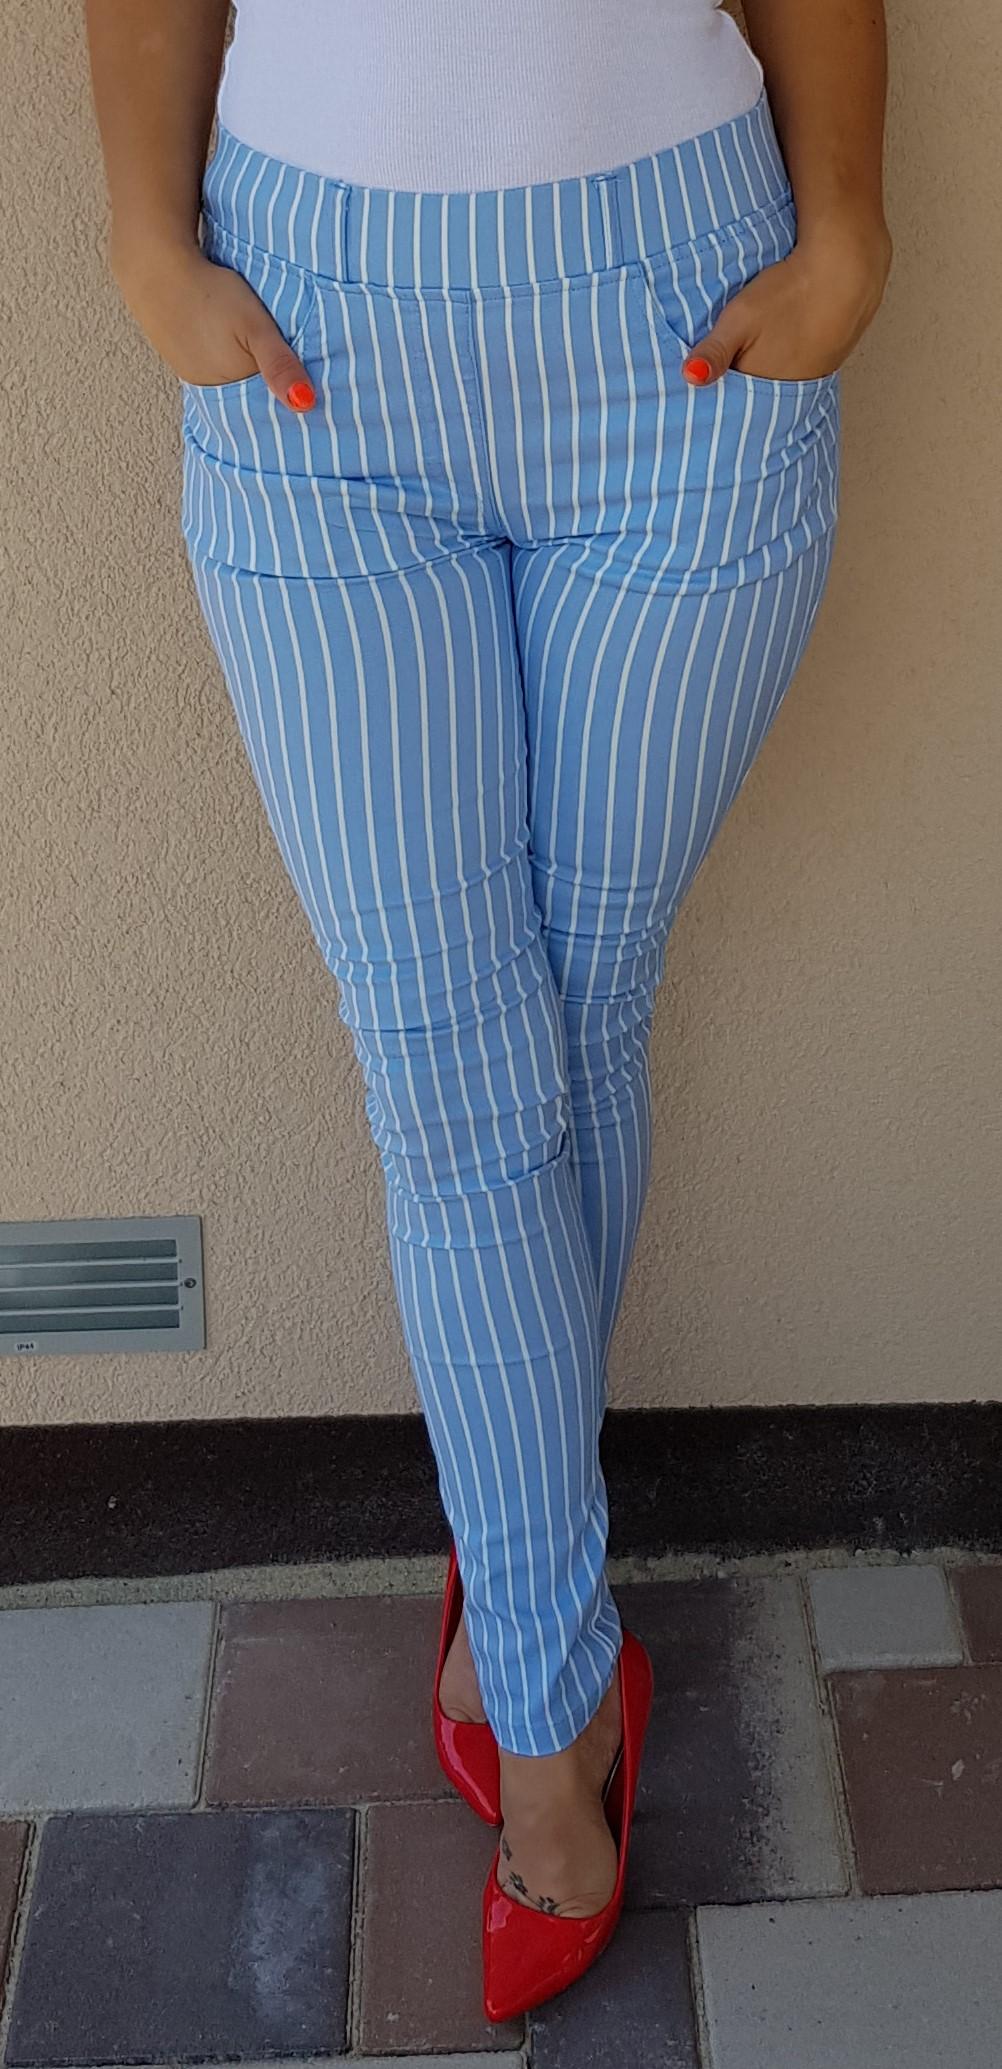 a9e48c982276 Pásikavé nohavice svetlo modré